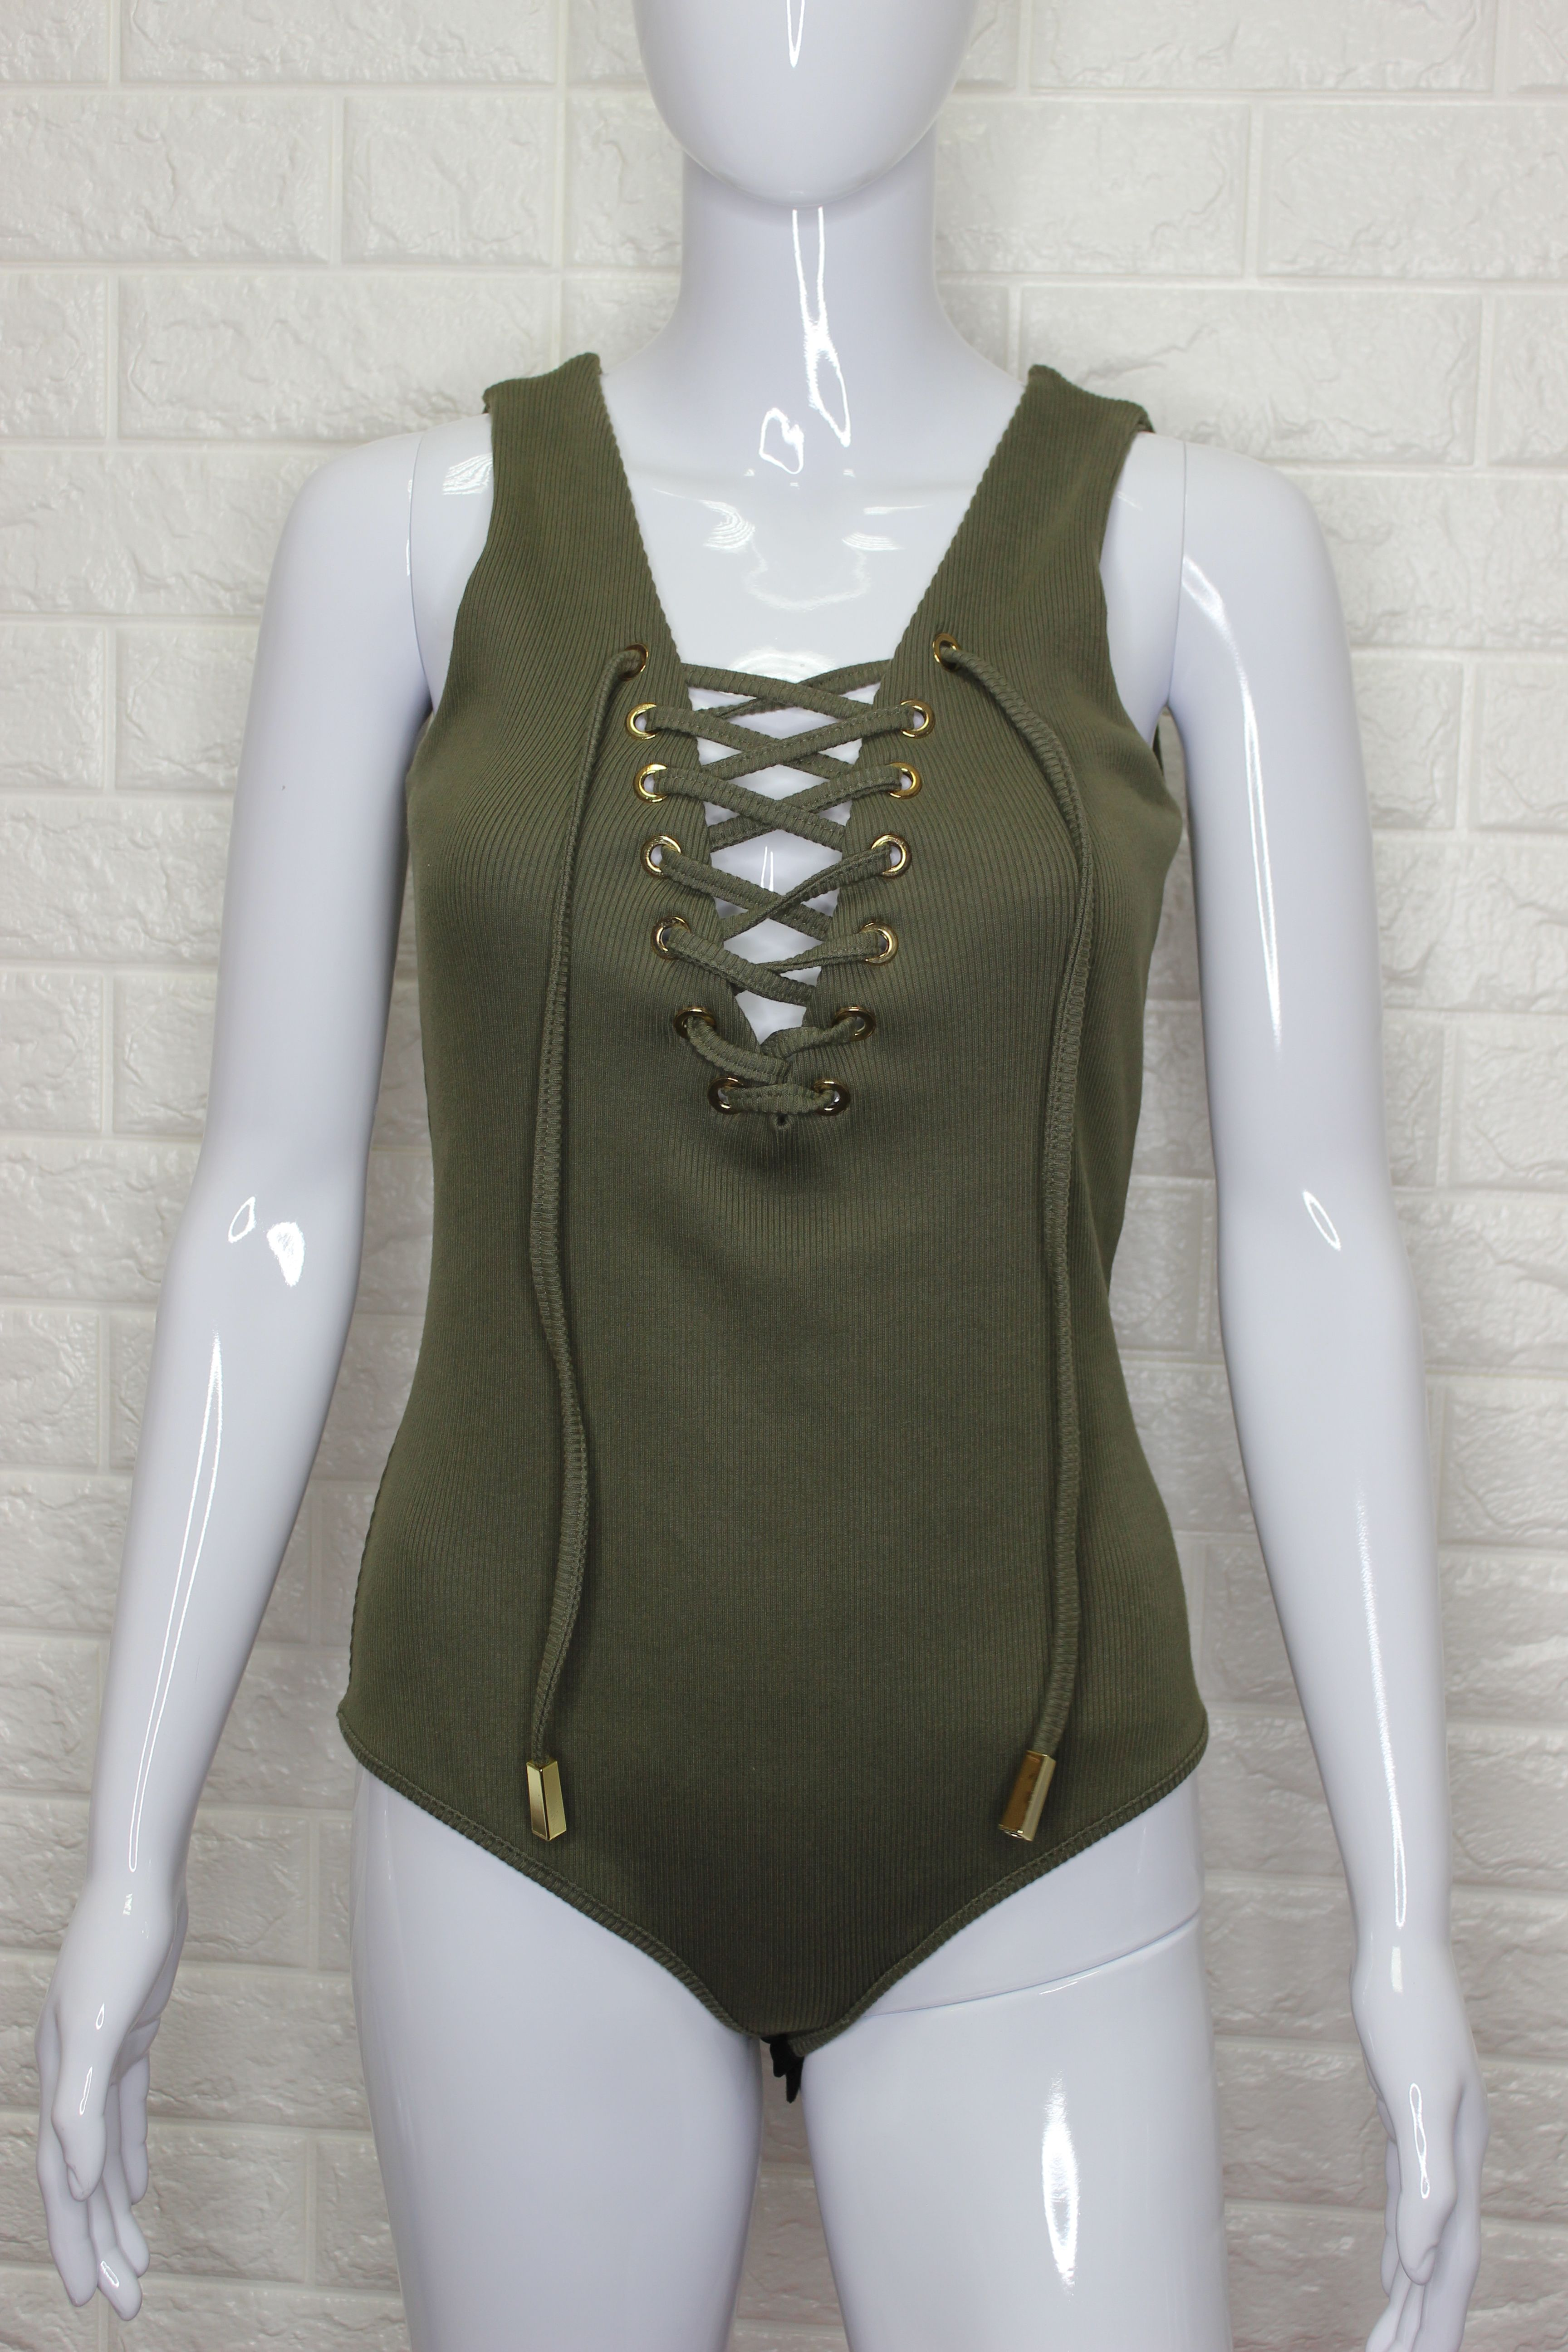 Khaki Lace Up Bodysuit